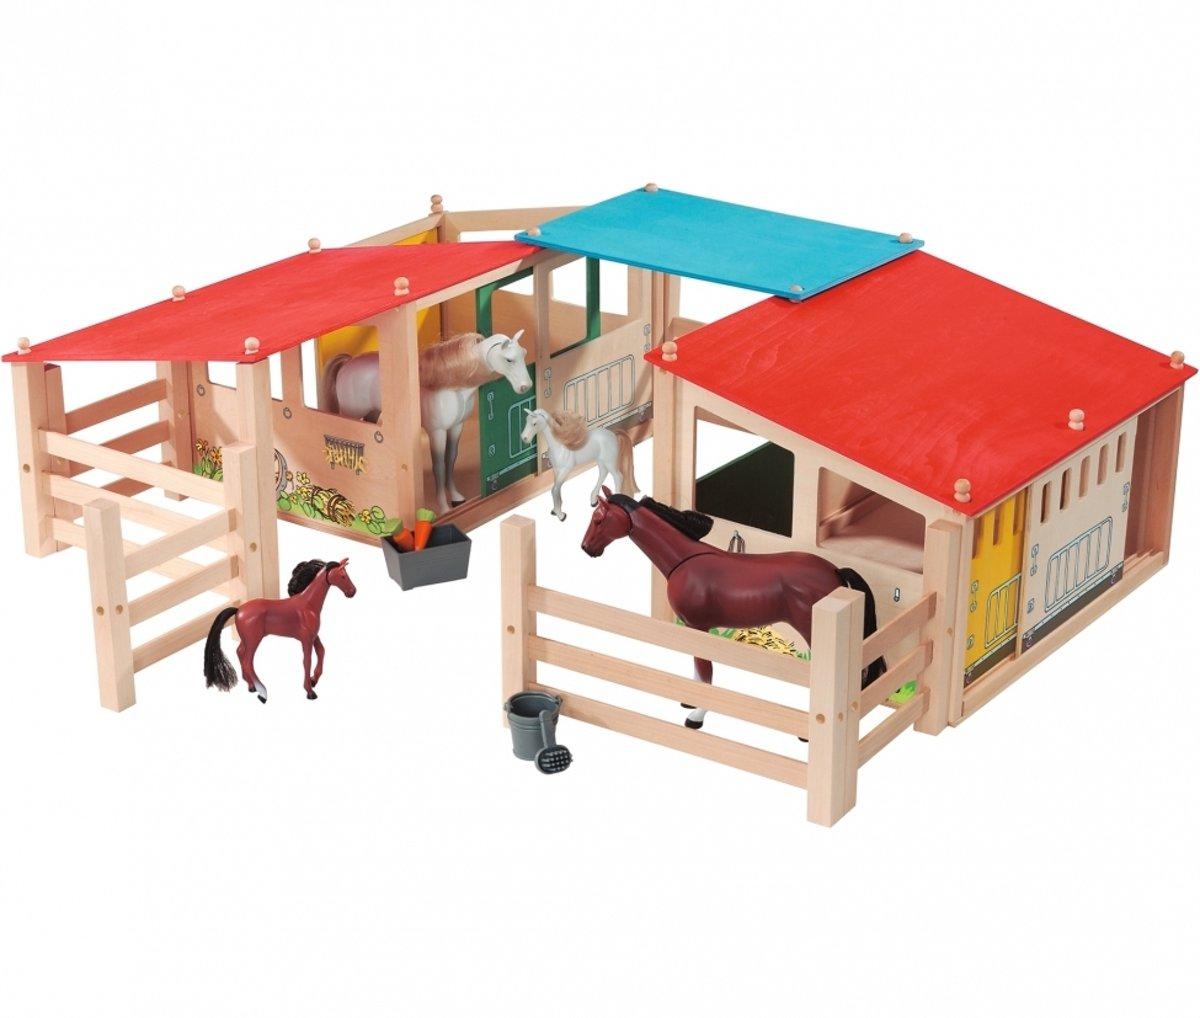 Eichhorn 4003046025170 rollenspelspeelgoed